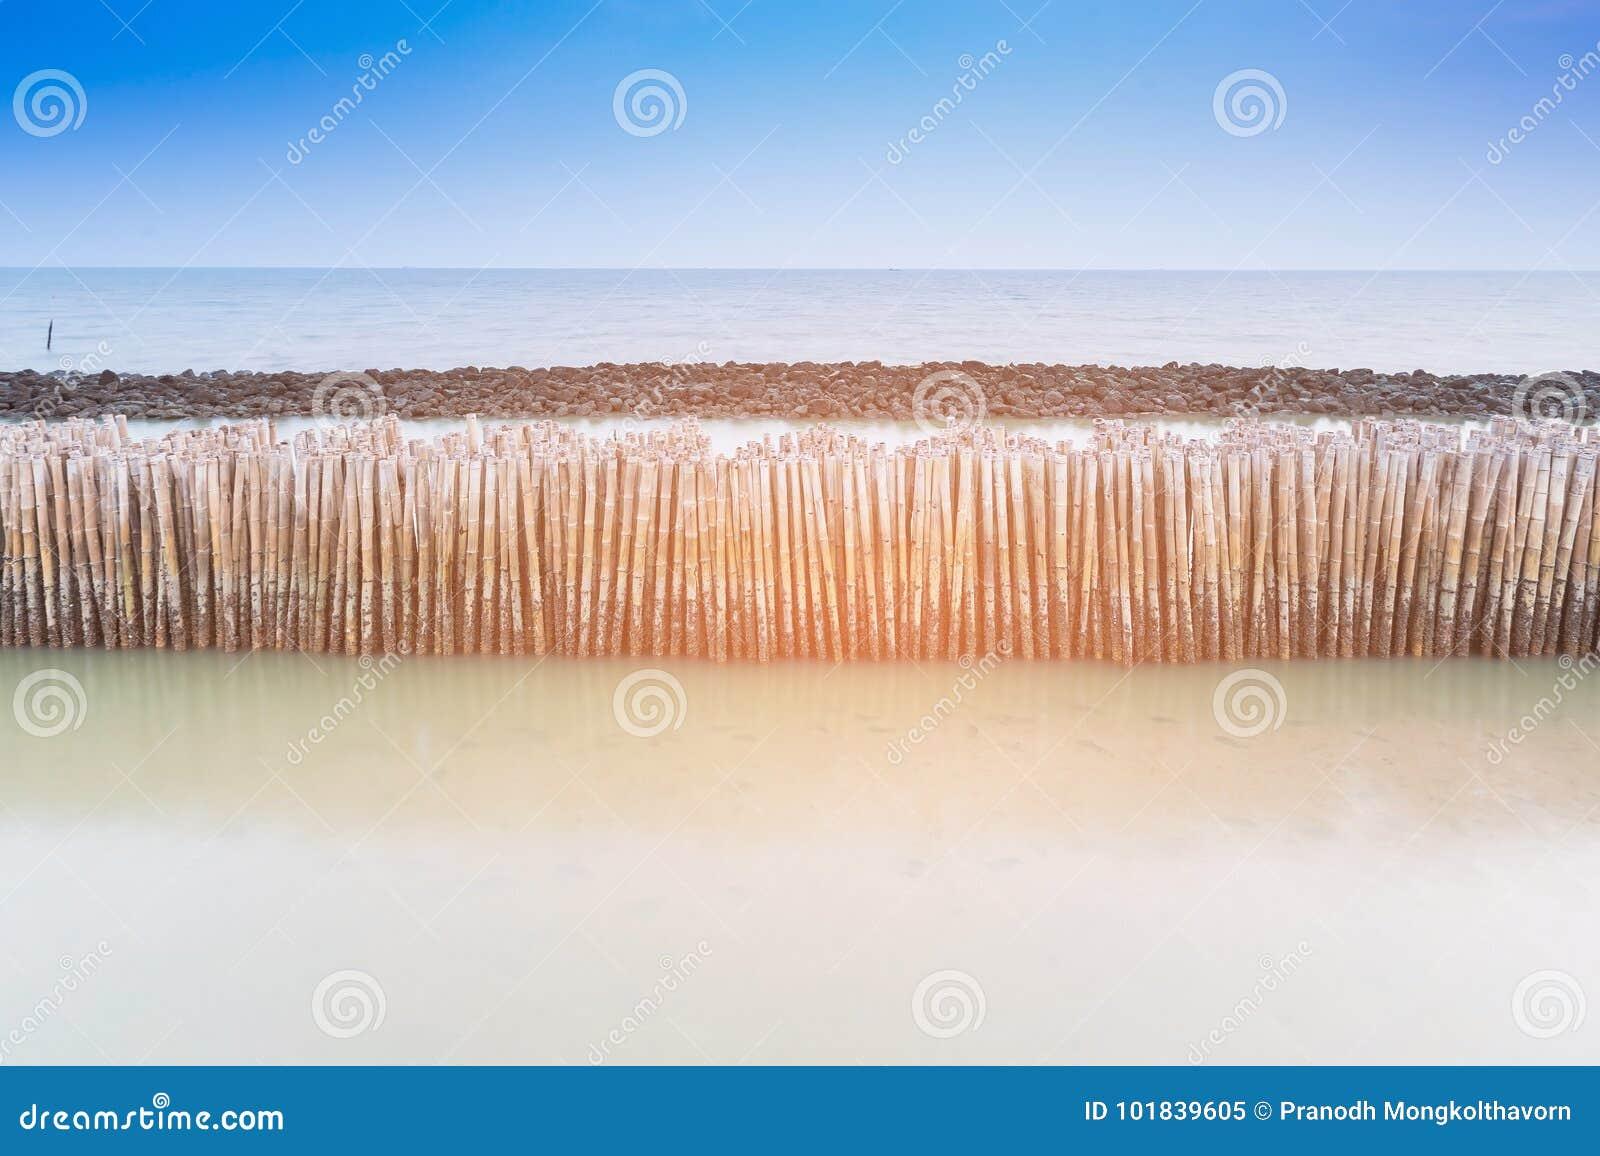 Bamboo seacoast wall barrier